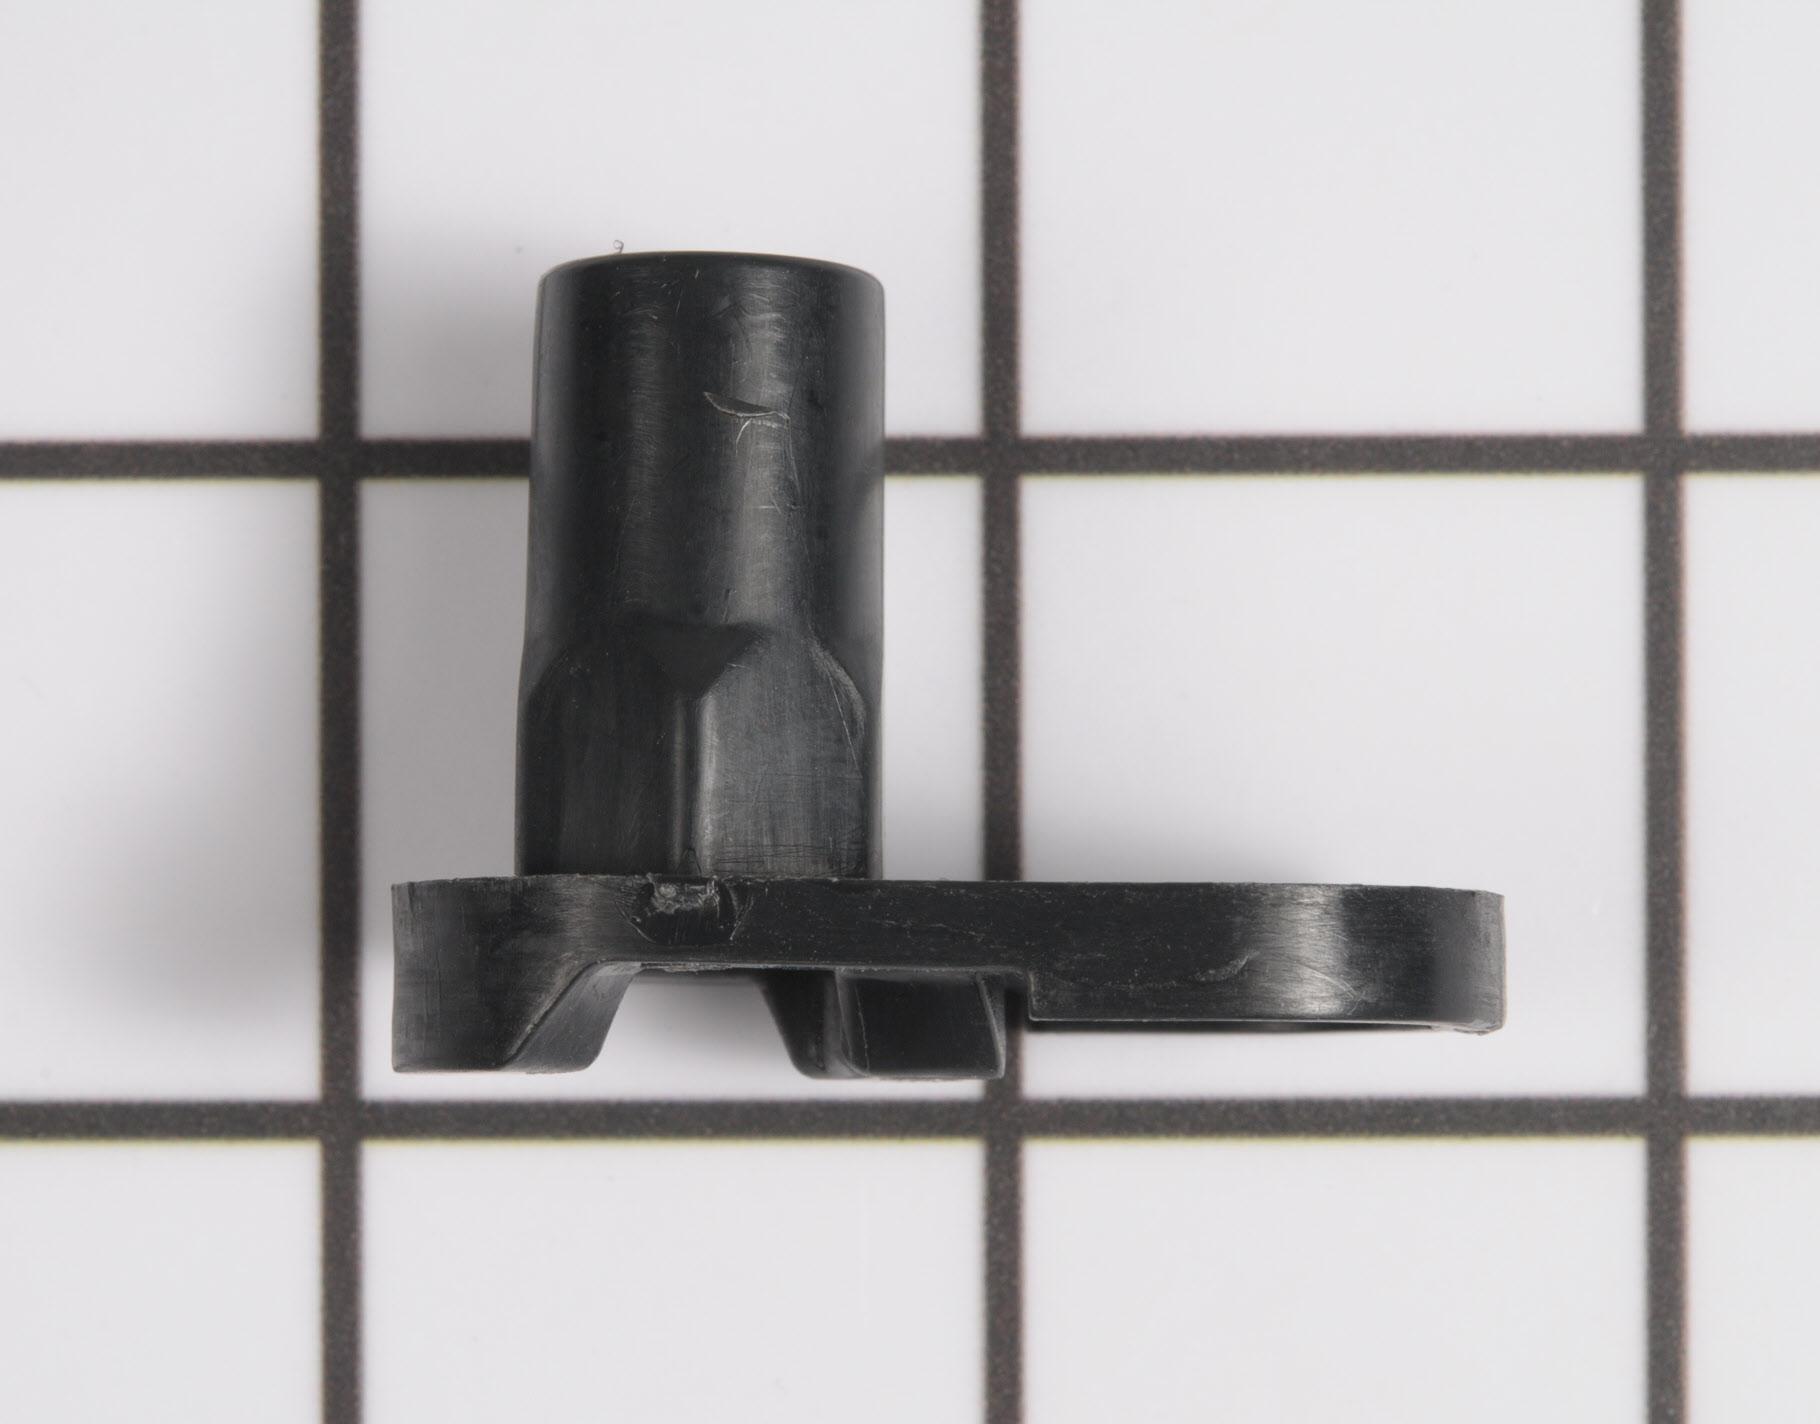 Maytag Refrigerator Part # WPW10257201 - Closing Cam